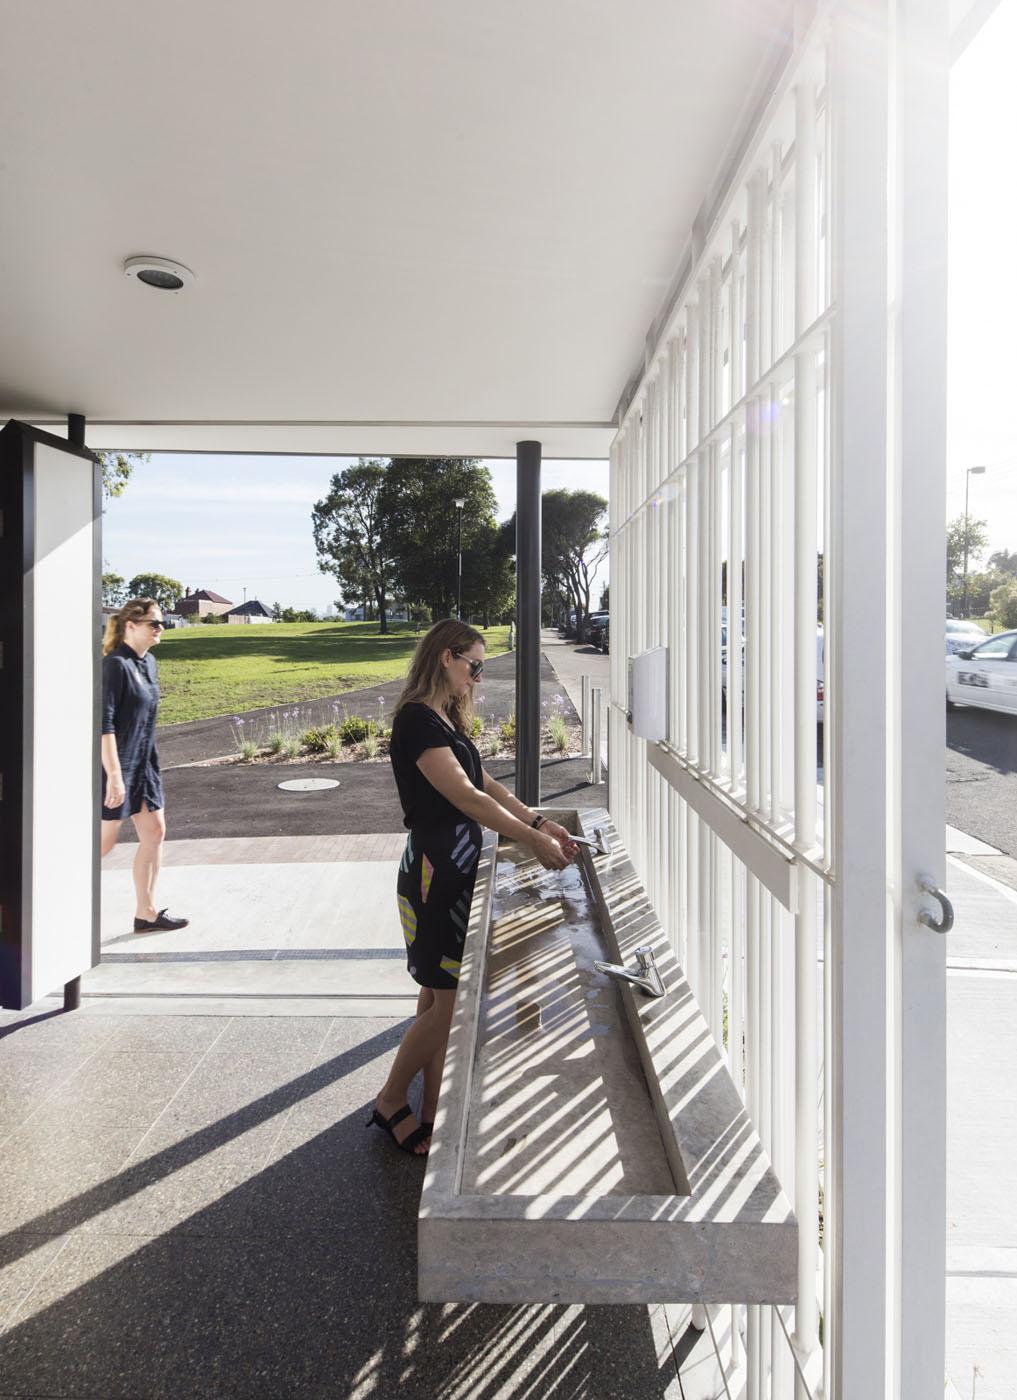 Sydenham Green Amenities by Sam Crawford Architects, Sydney. Concrete wash basin.